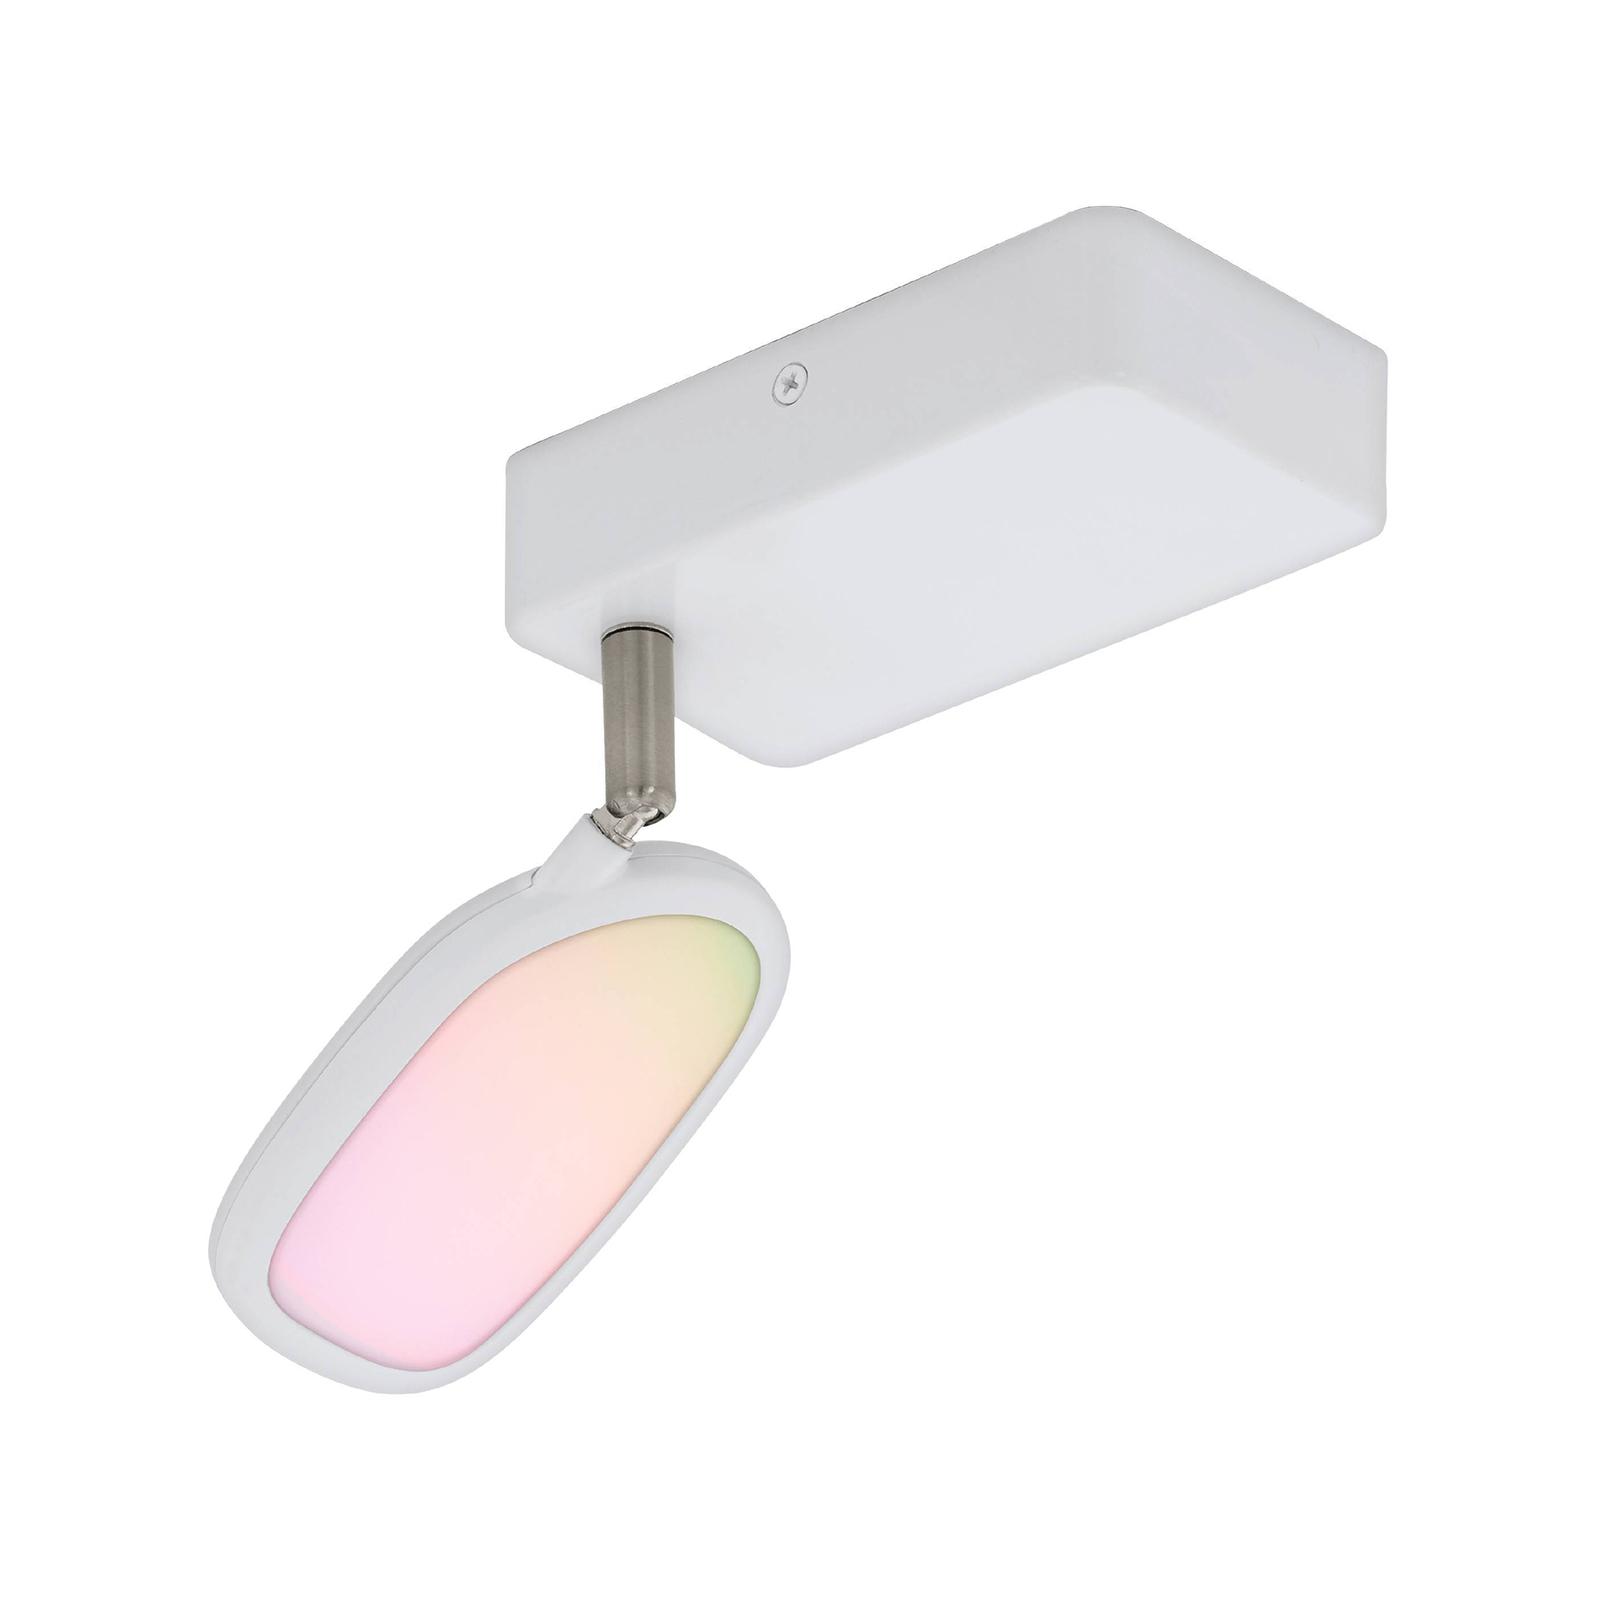 EGLO connect Palombare-C LED-loftspot, 1 lyskilde